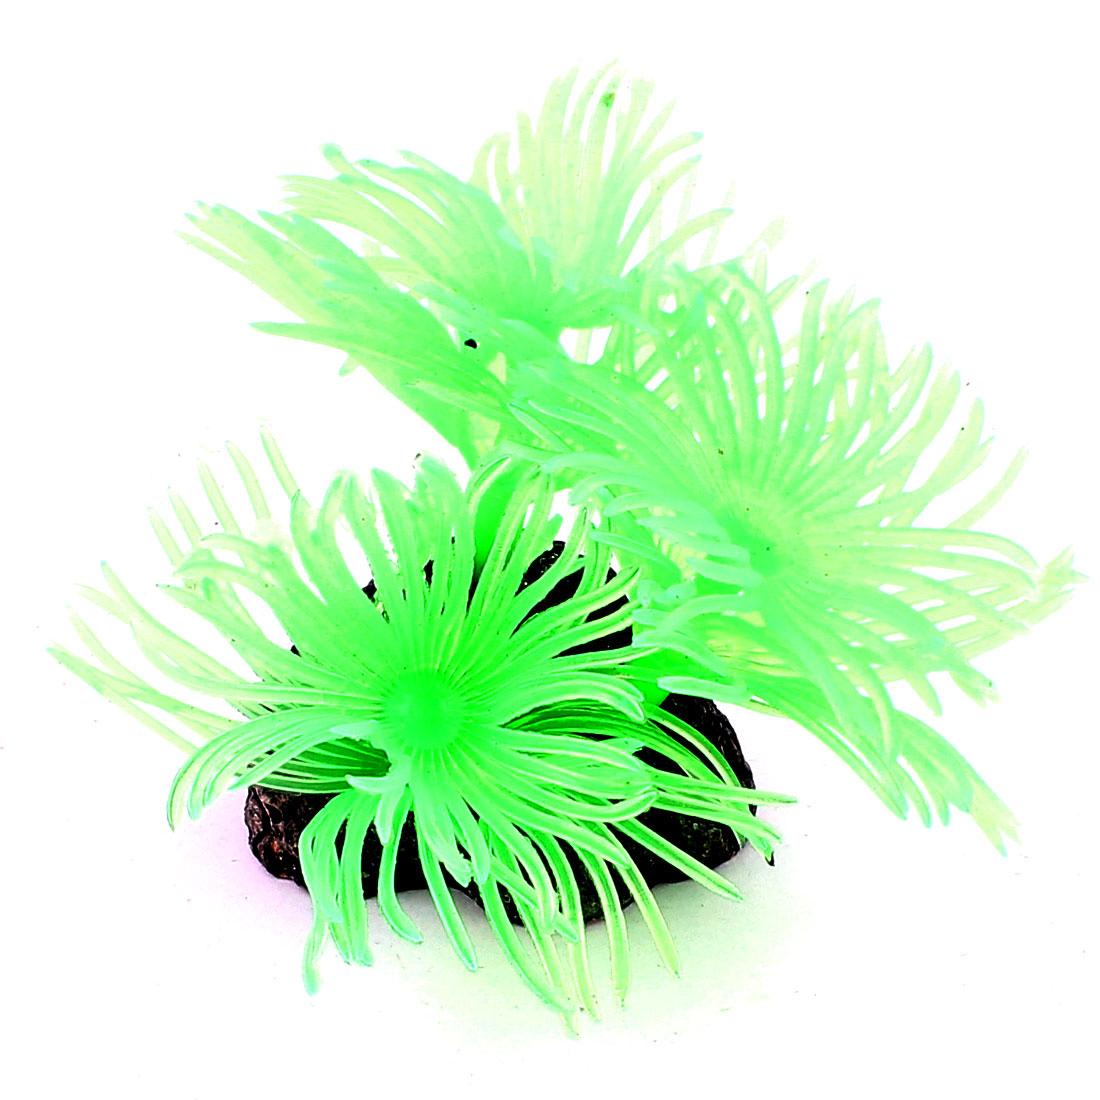 Aquarium Underwater Soft Silicone Artificial Coral Plant Decor Green